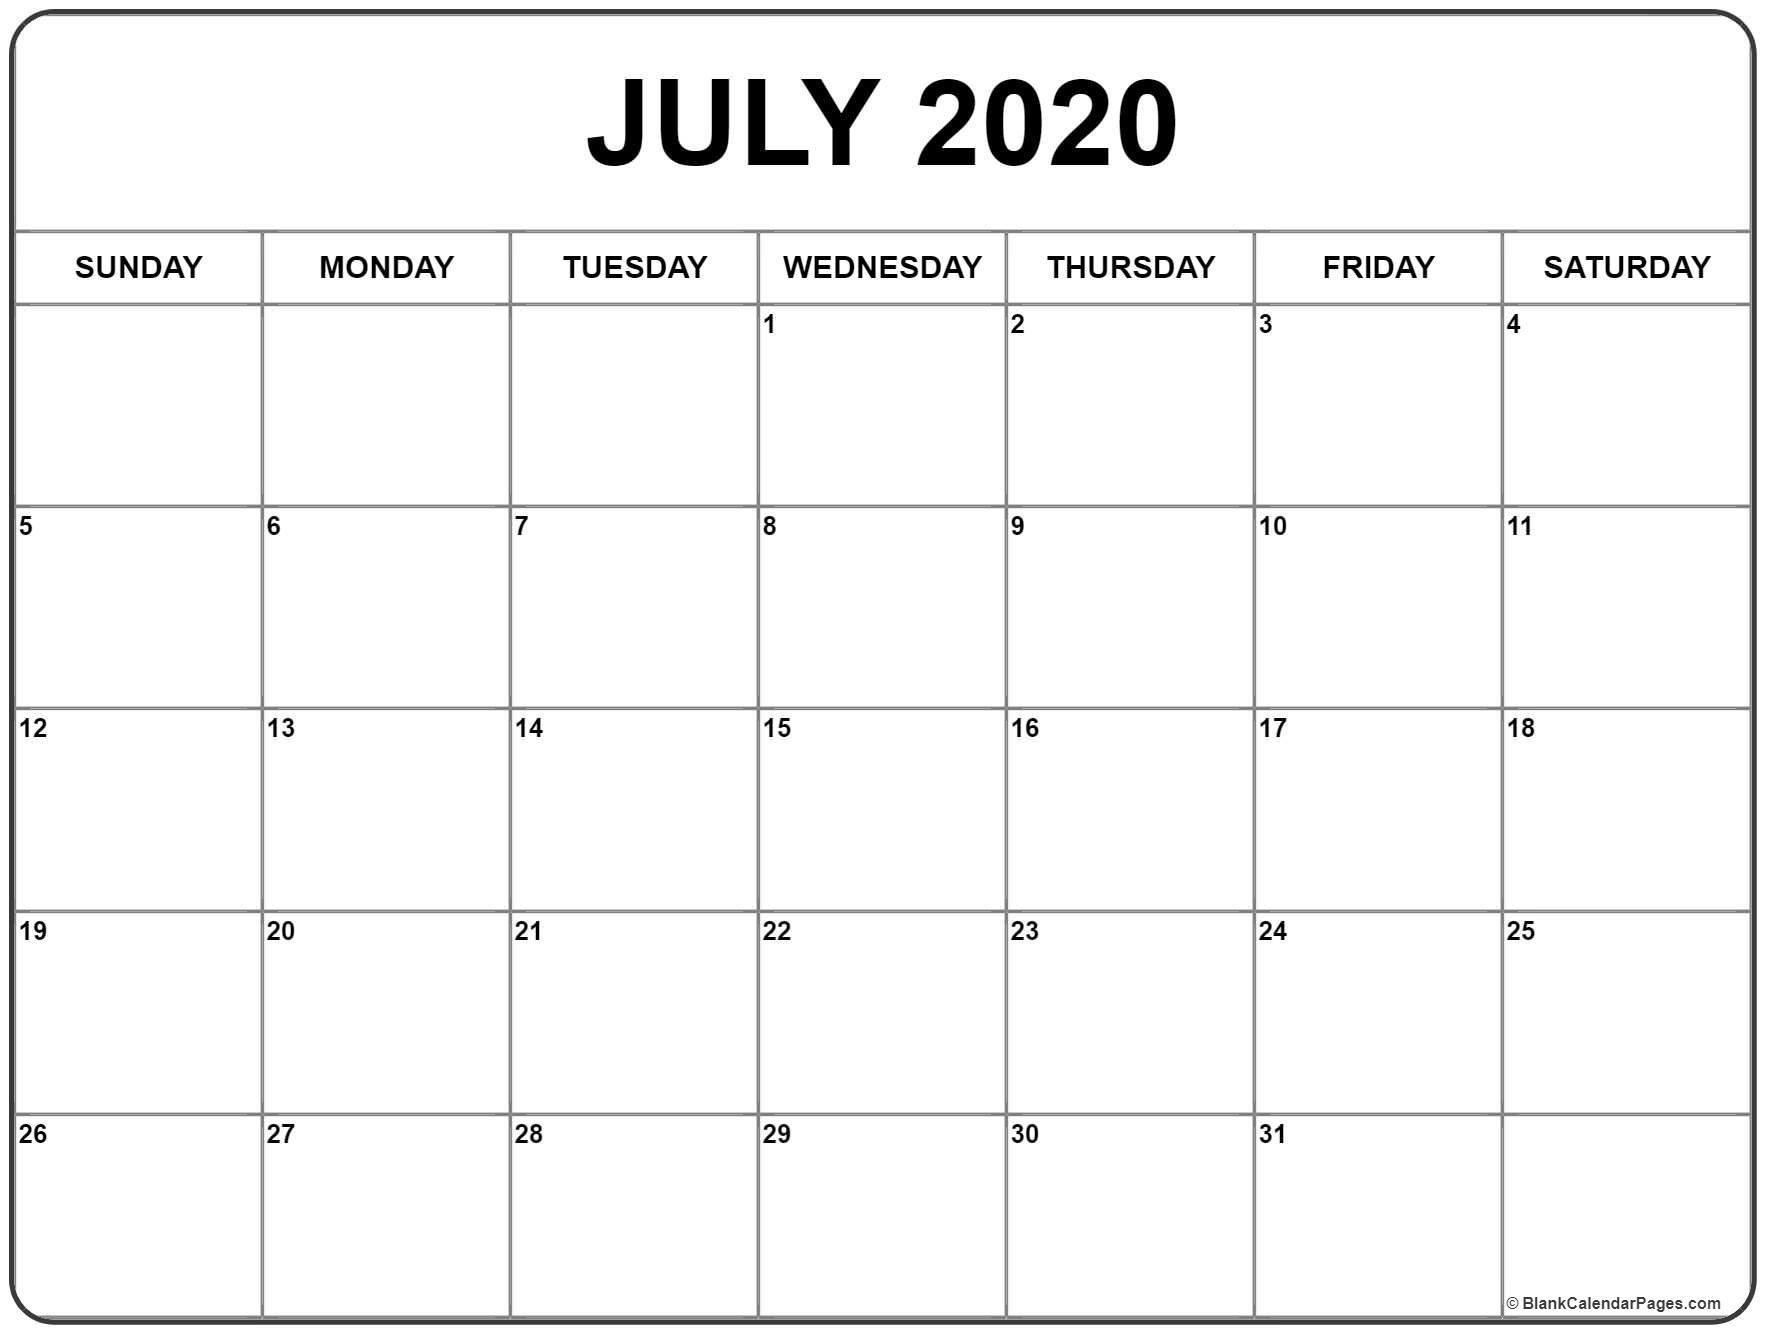 July 2020 Calendar | Printable Calendars | Printable Blank-2020-2020 Printable Calendar With No Holidays